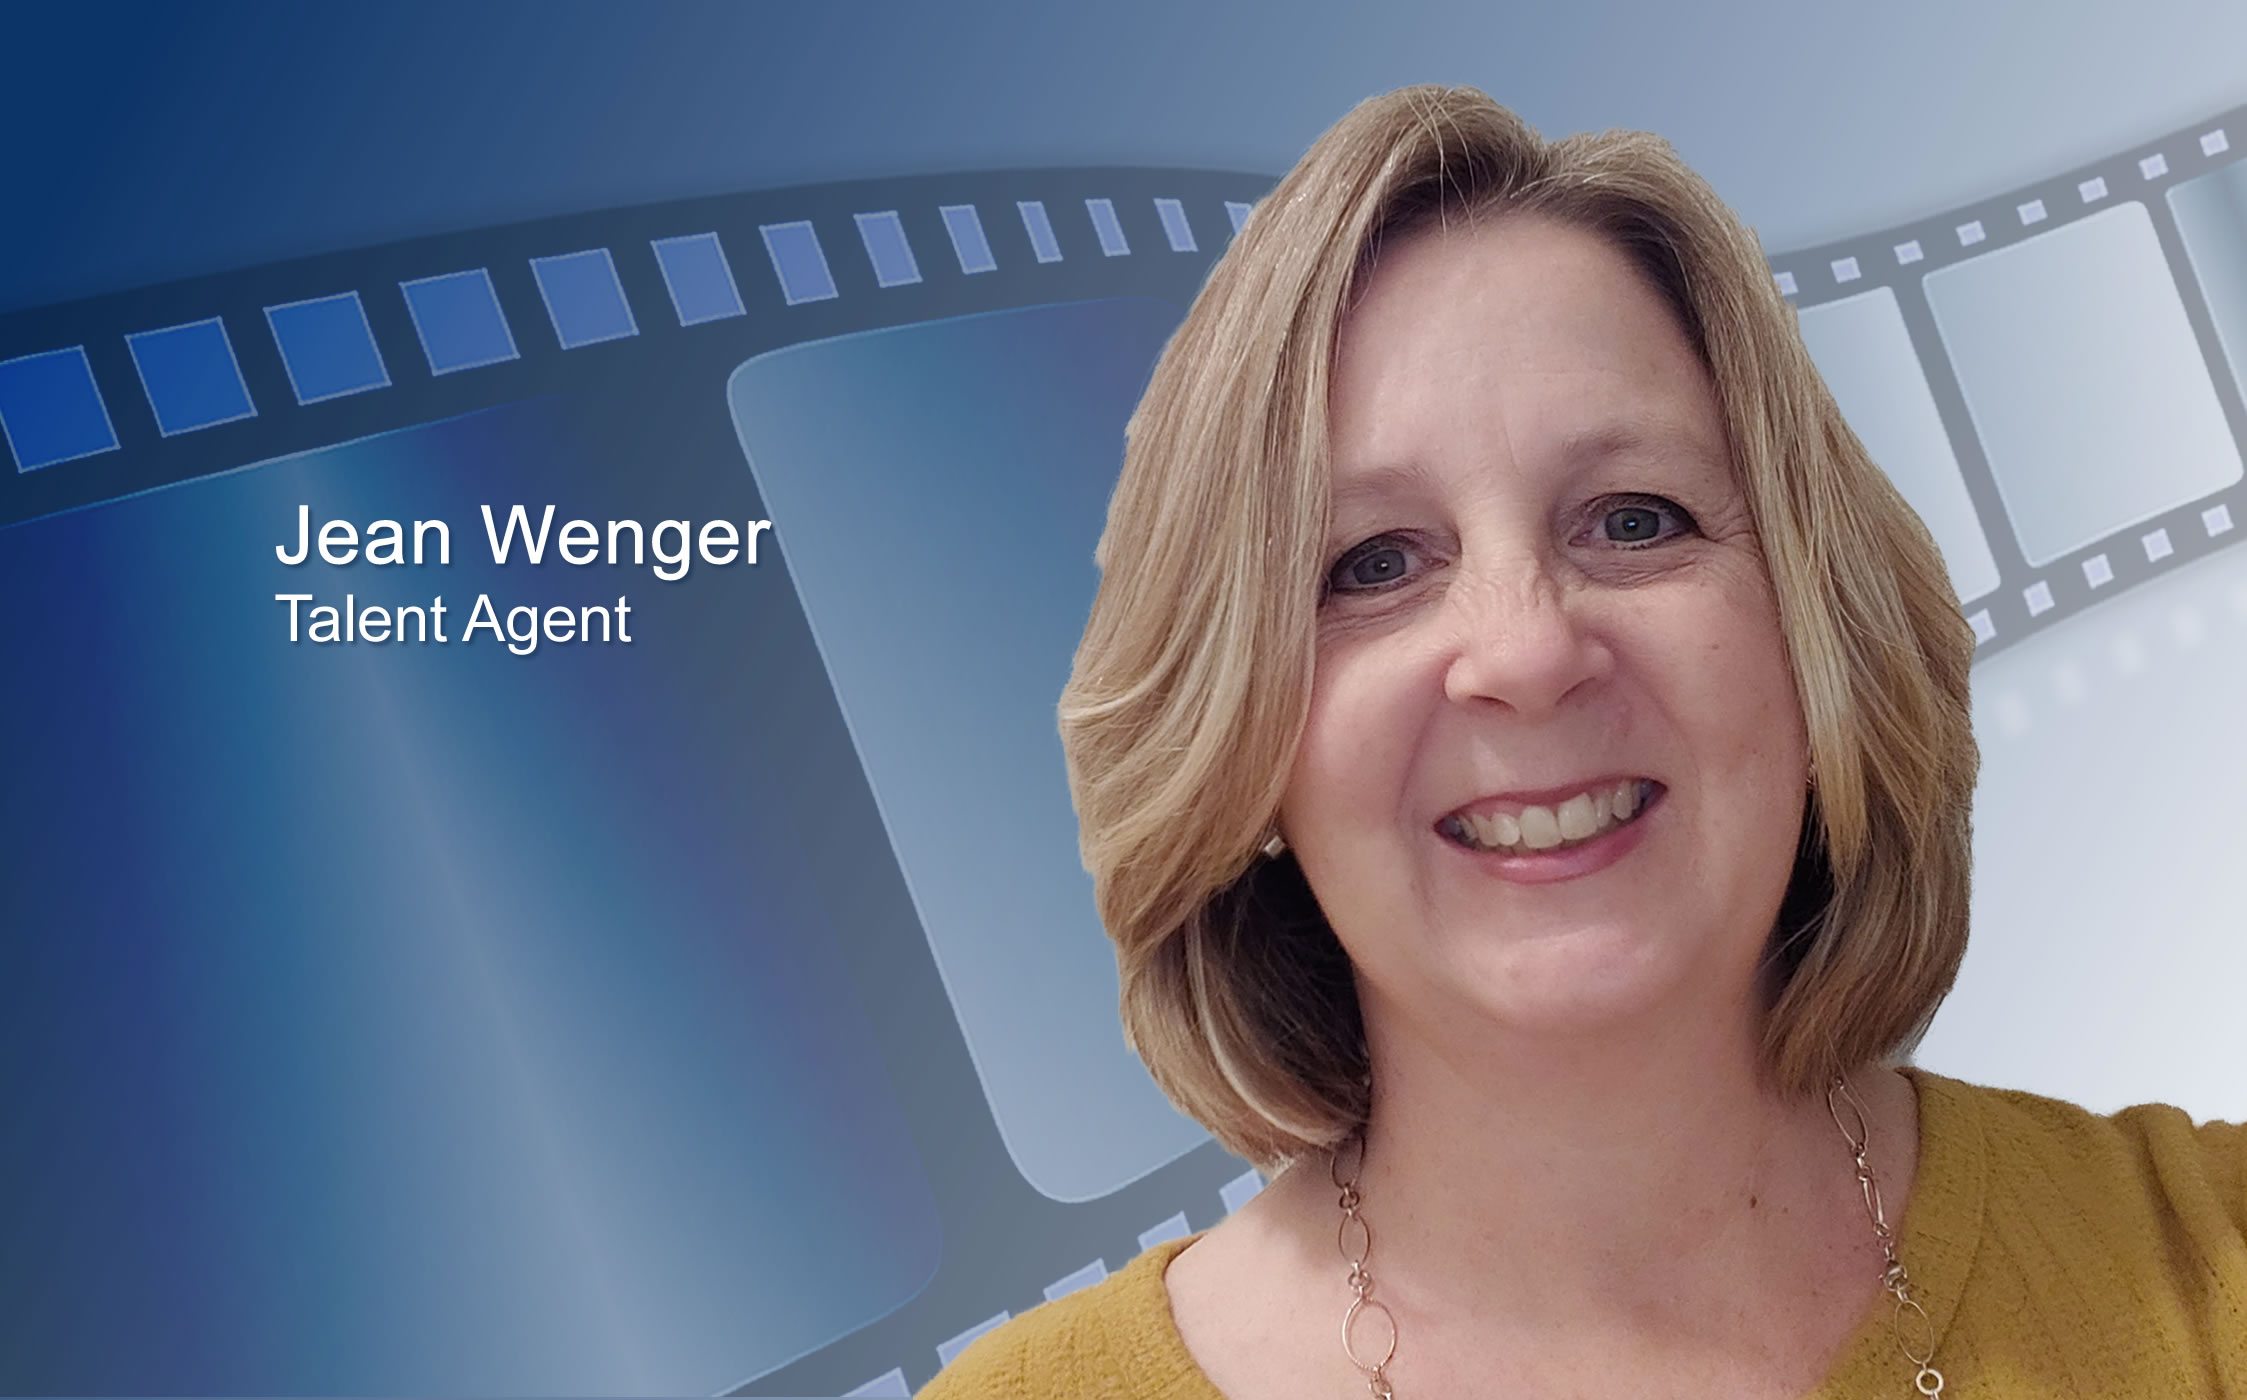 Jean Wenger